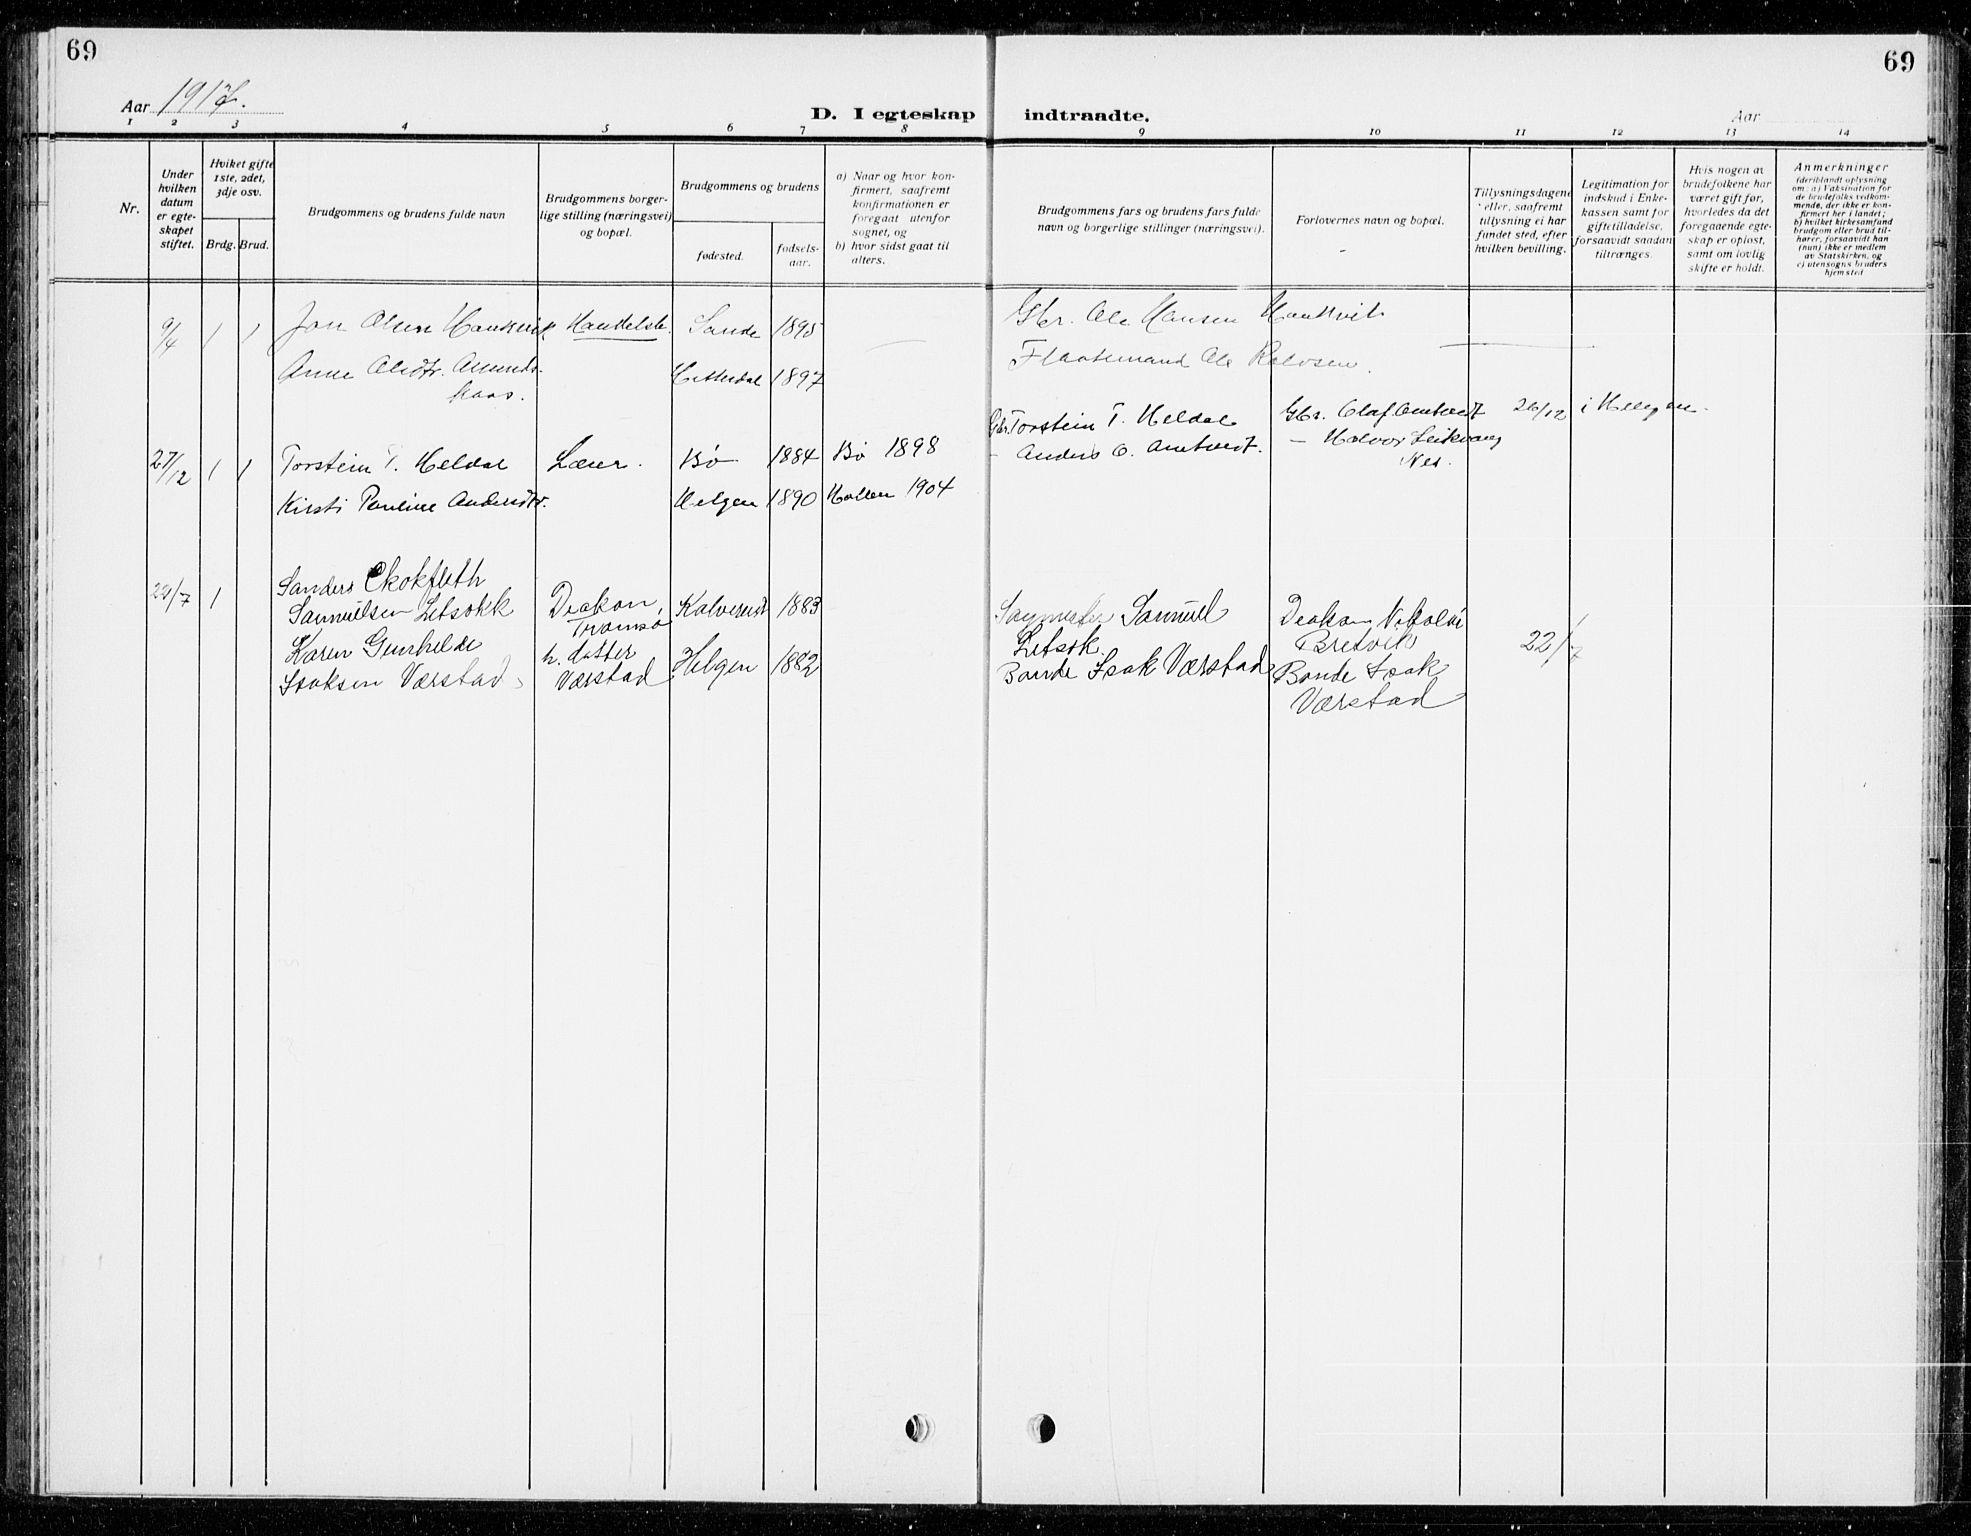 SAKO, Holla kirkebøker, G/Gb/L0003: Klokkerbok nr. II 3, 1914-1941, s. 69